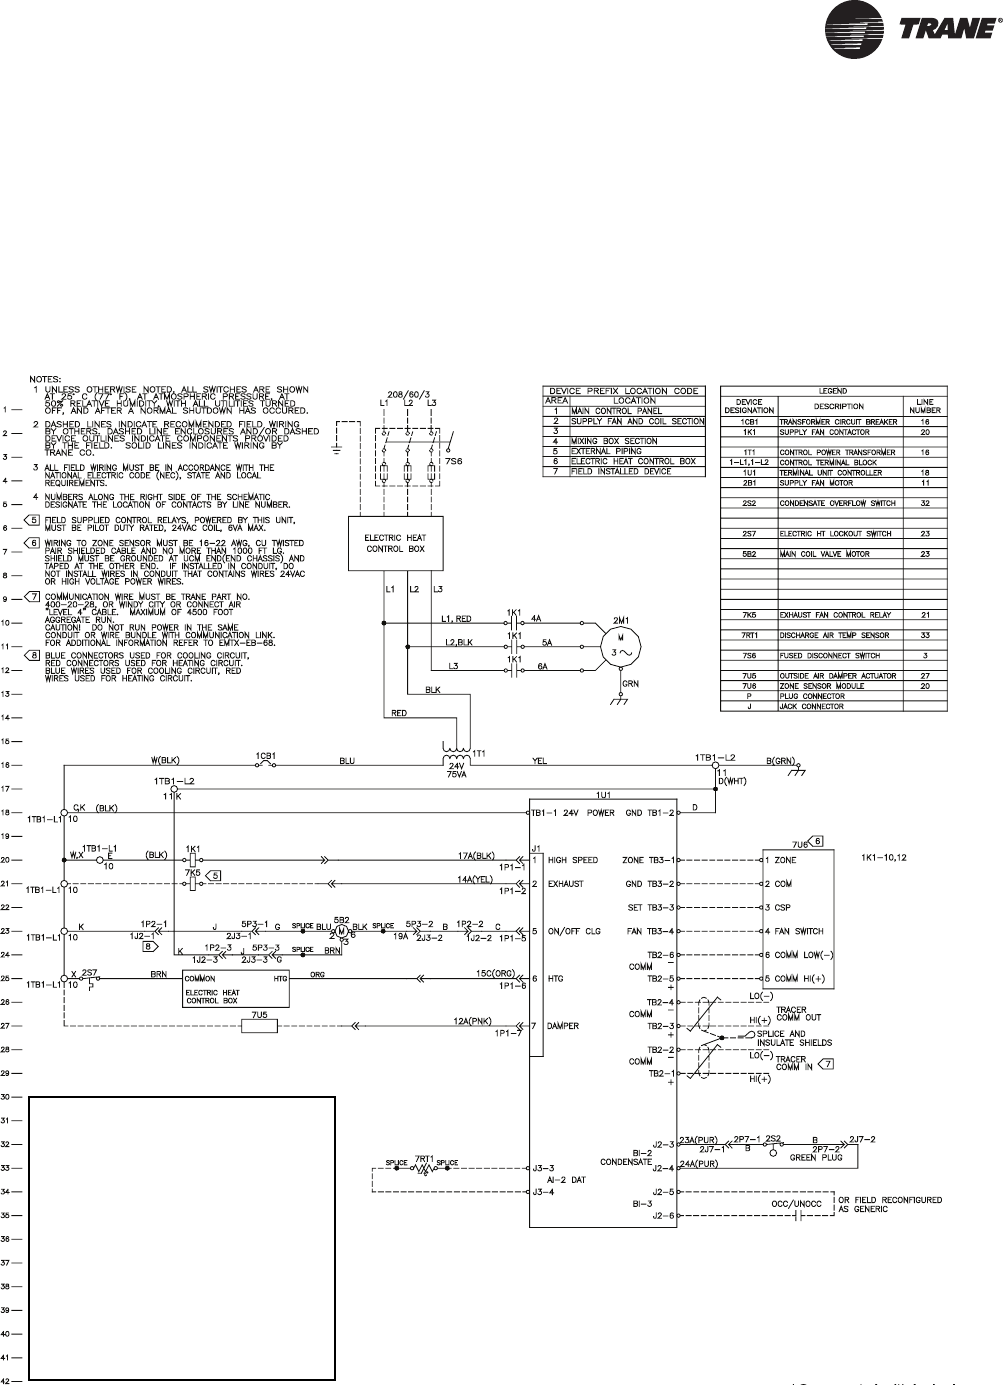 Trane Economizer Wiring Diagram Trane X13651513030 Manual • Free ...